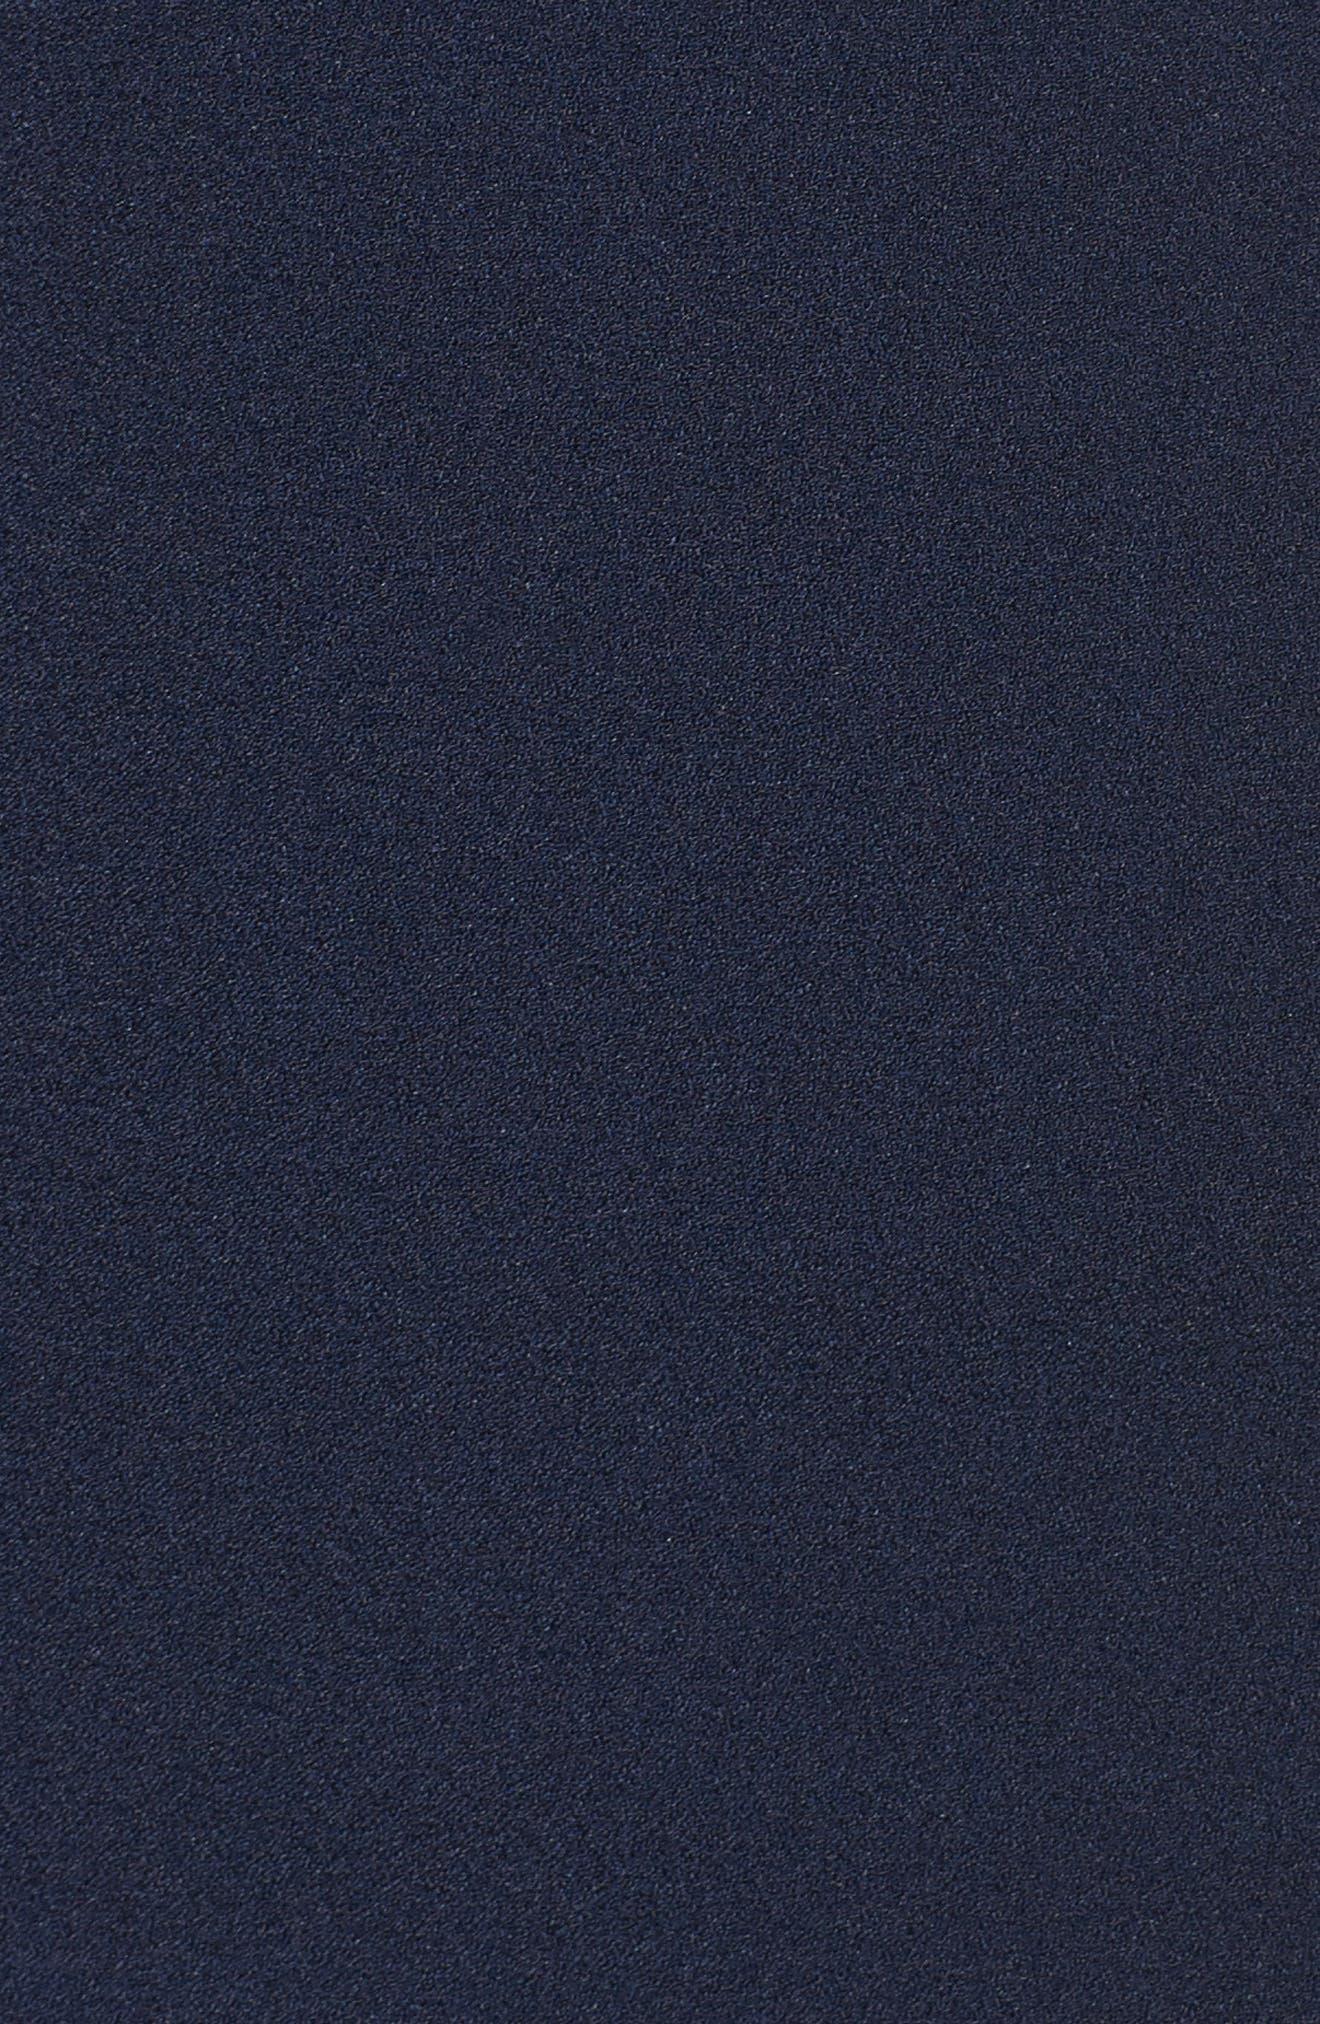 Ruffle Sheath Dress,                             Alternate thumbnail 6, color,                             Navy